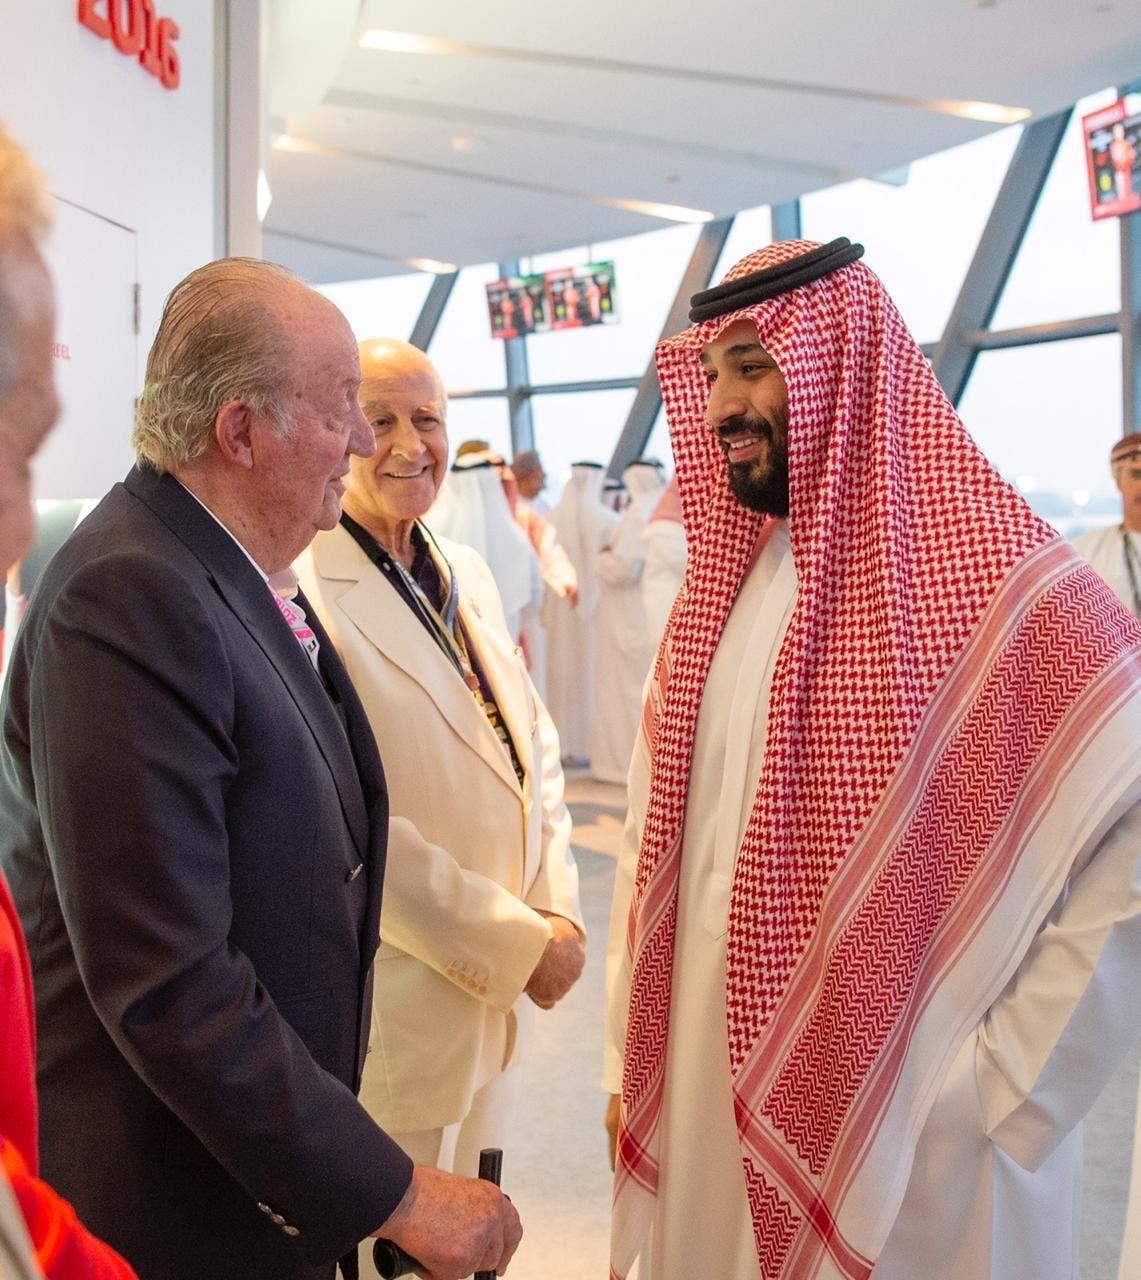 VIDEO: Saudi Crown Prince tours Abu Dhabi Grand Prix